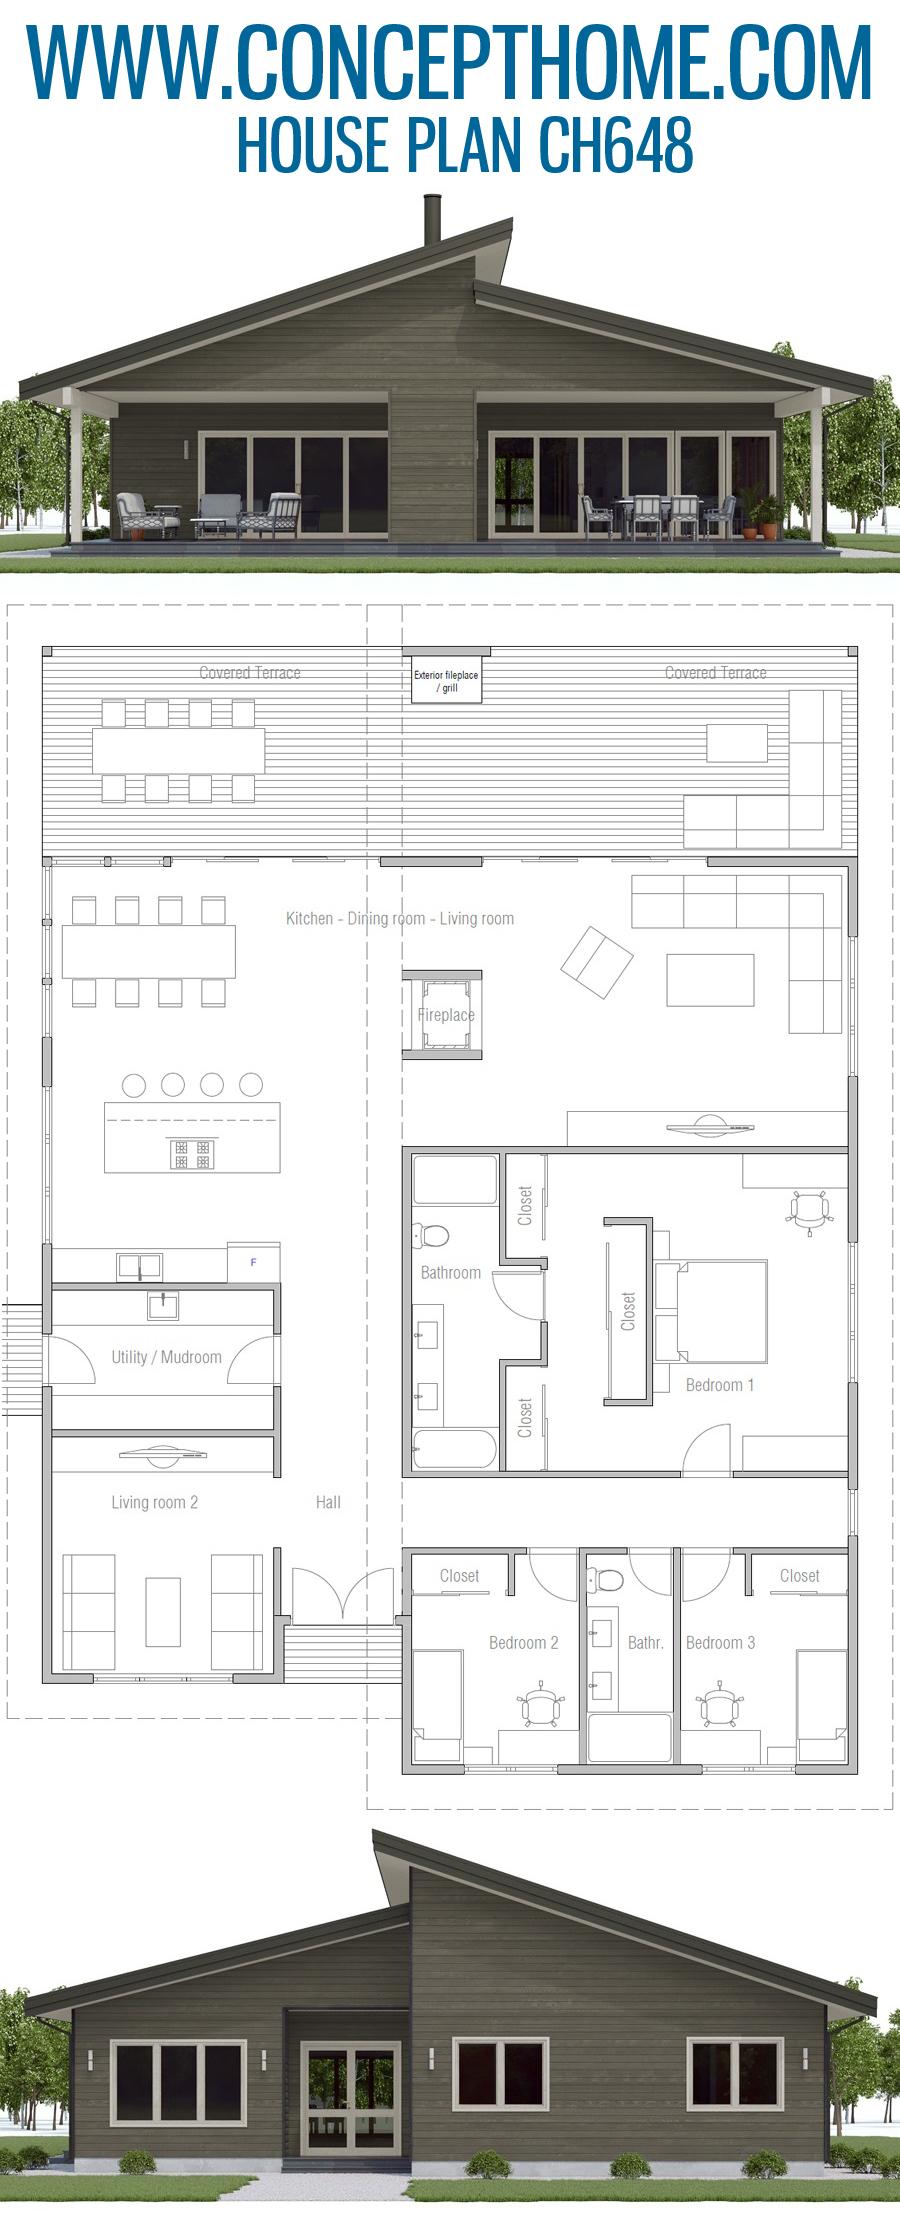 House Plan Ch648 In 2020 House Plans Beachfront House House Plans Farmhouse